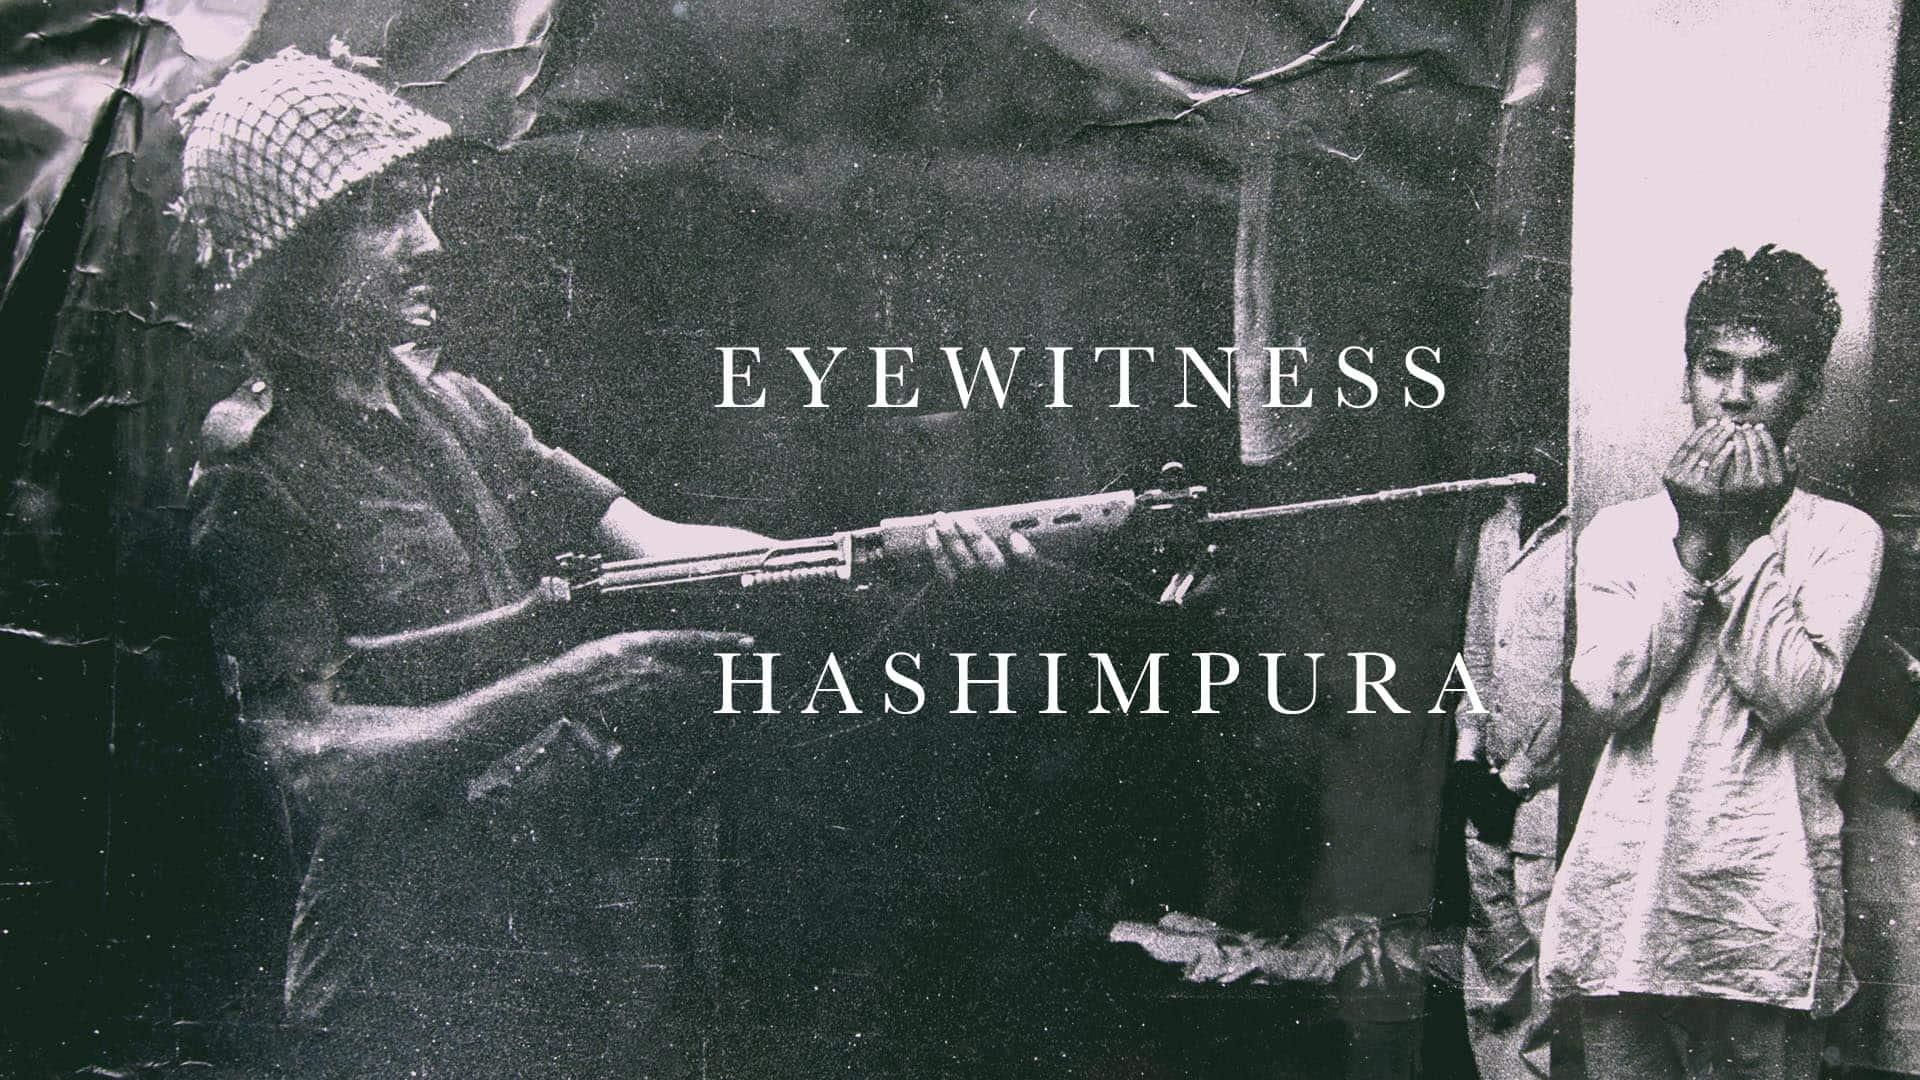 Photographer Praveen Jain was in the Meerut neighbourhood on May 22, 1987, hours before the Hashimpuramassacre